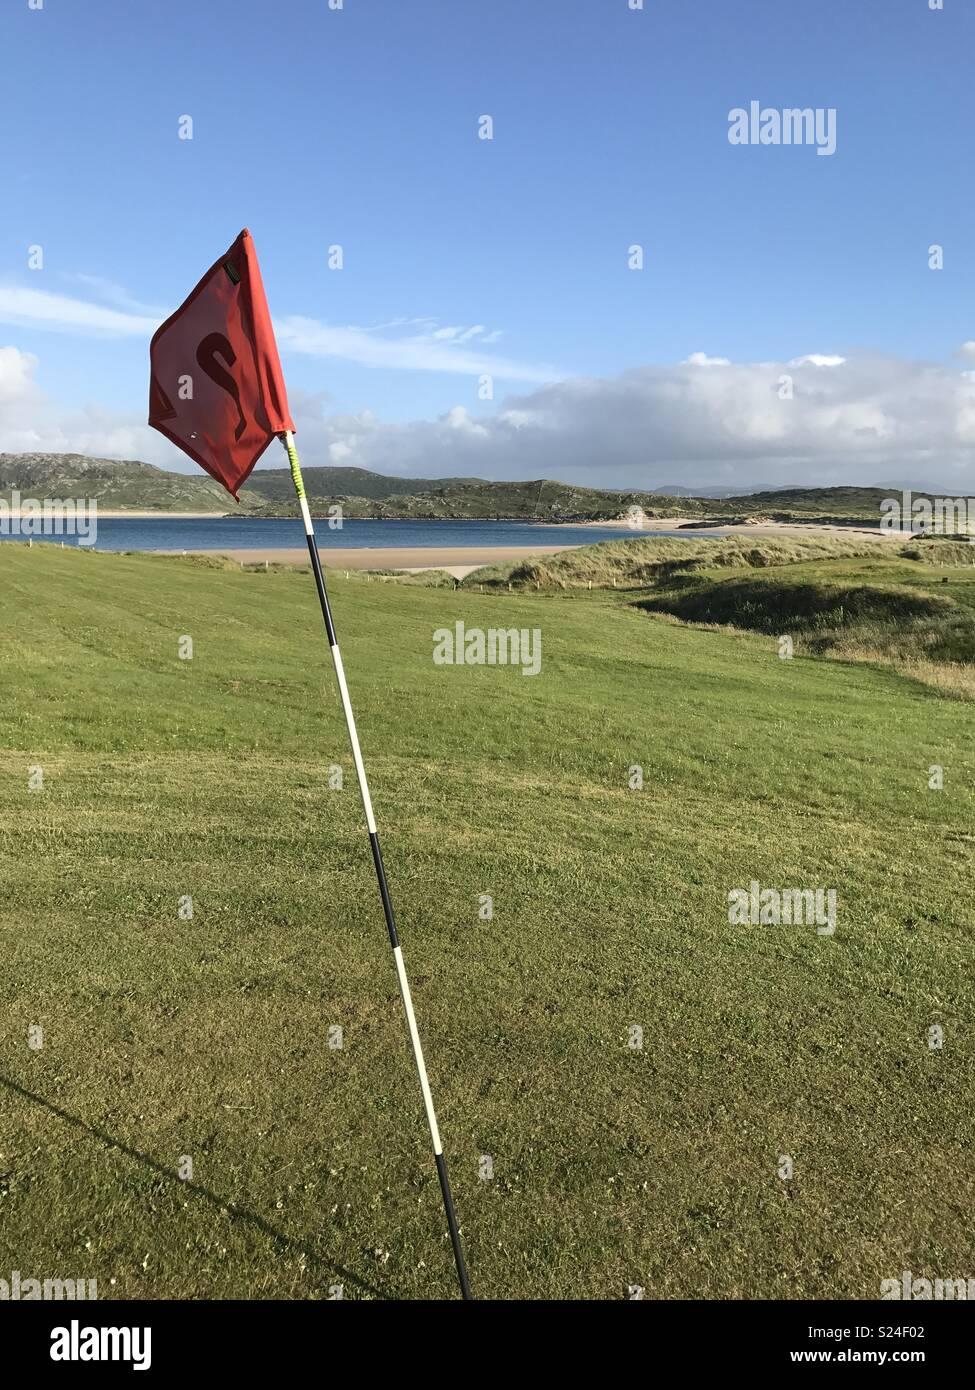 Golf links fairway - Stock Image